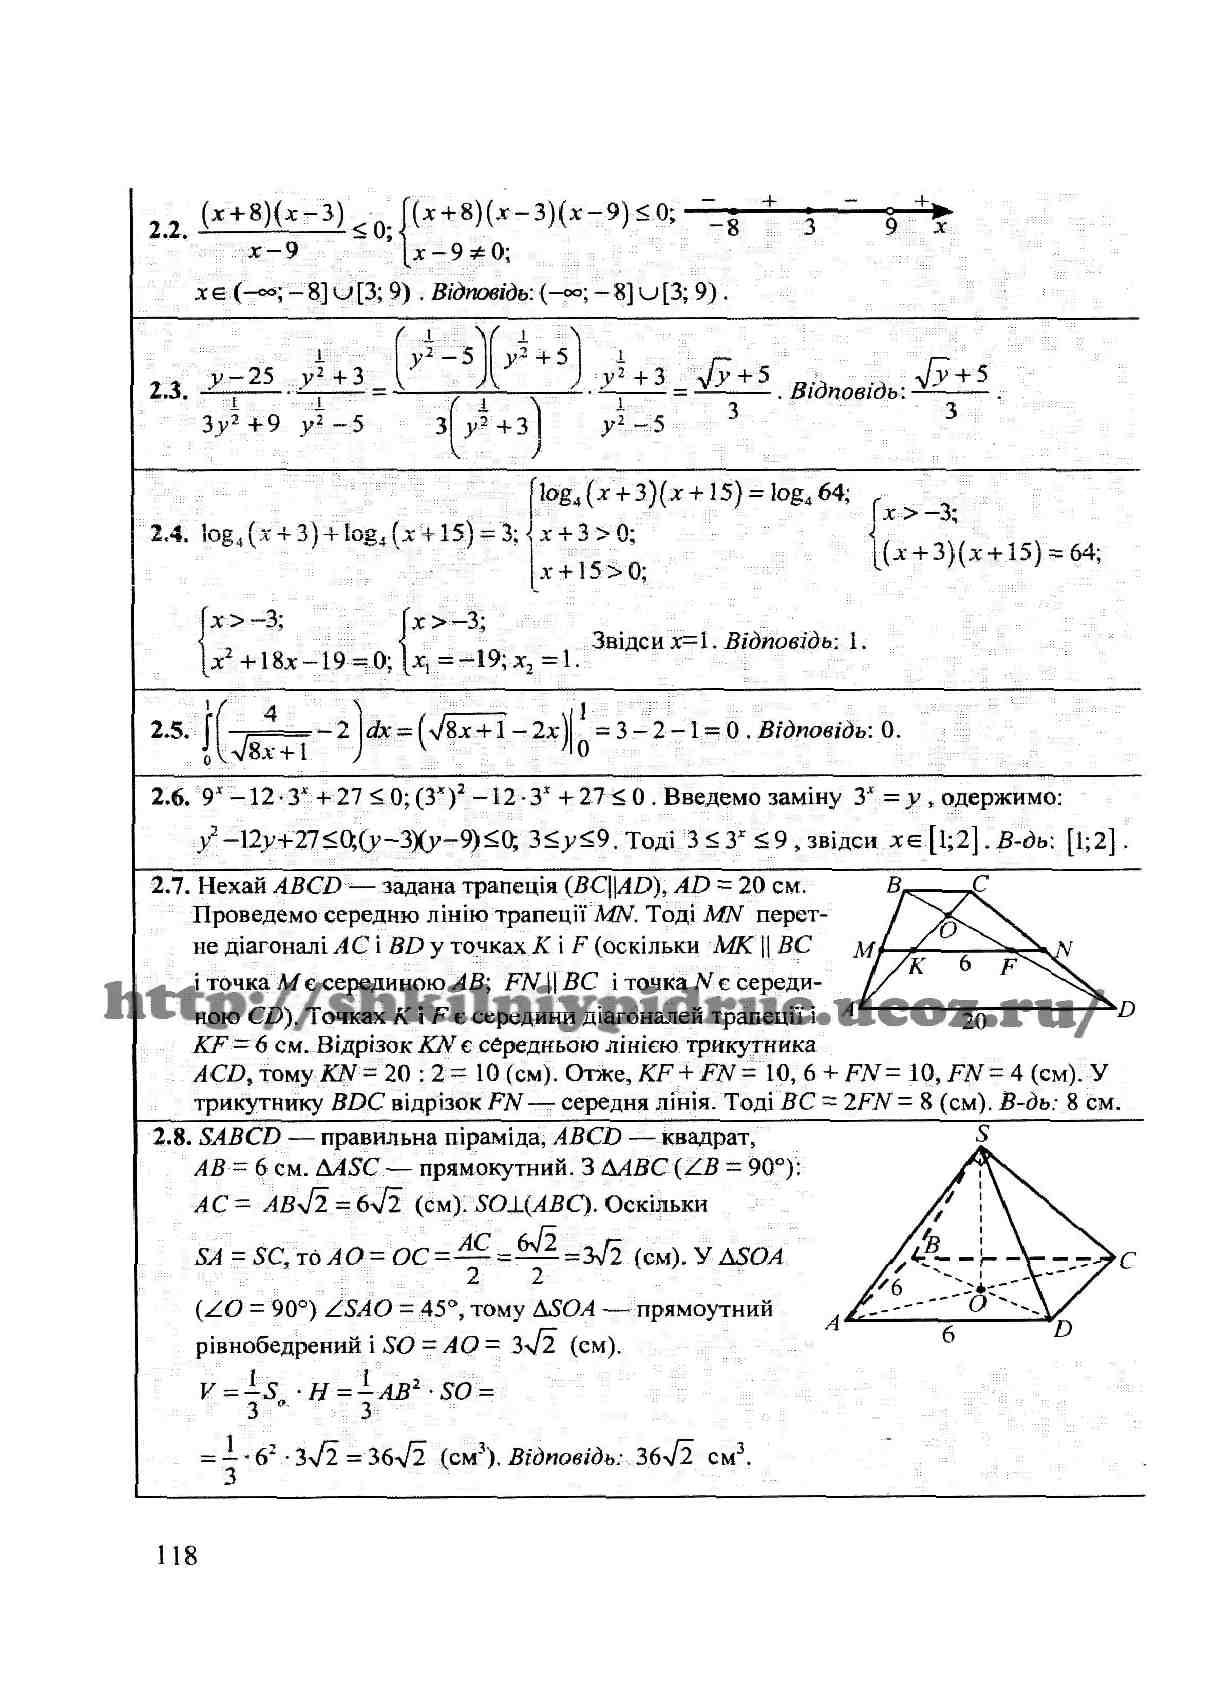 решебник для дпа по химии